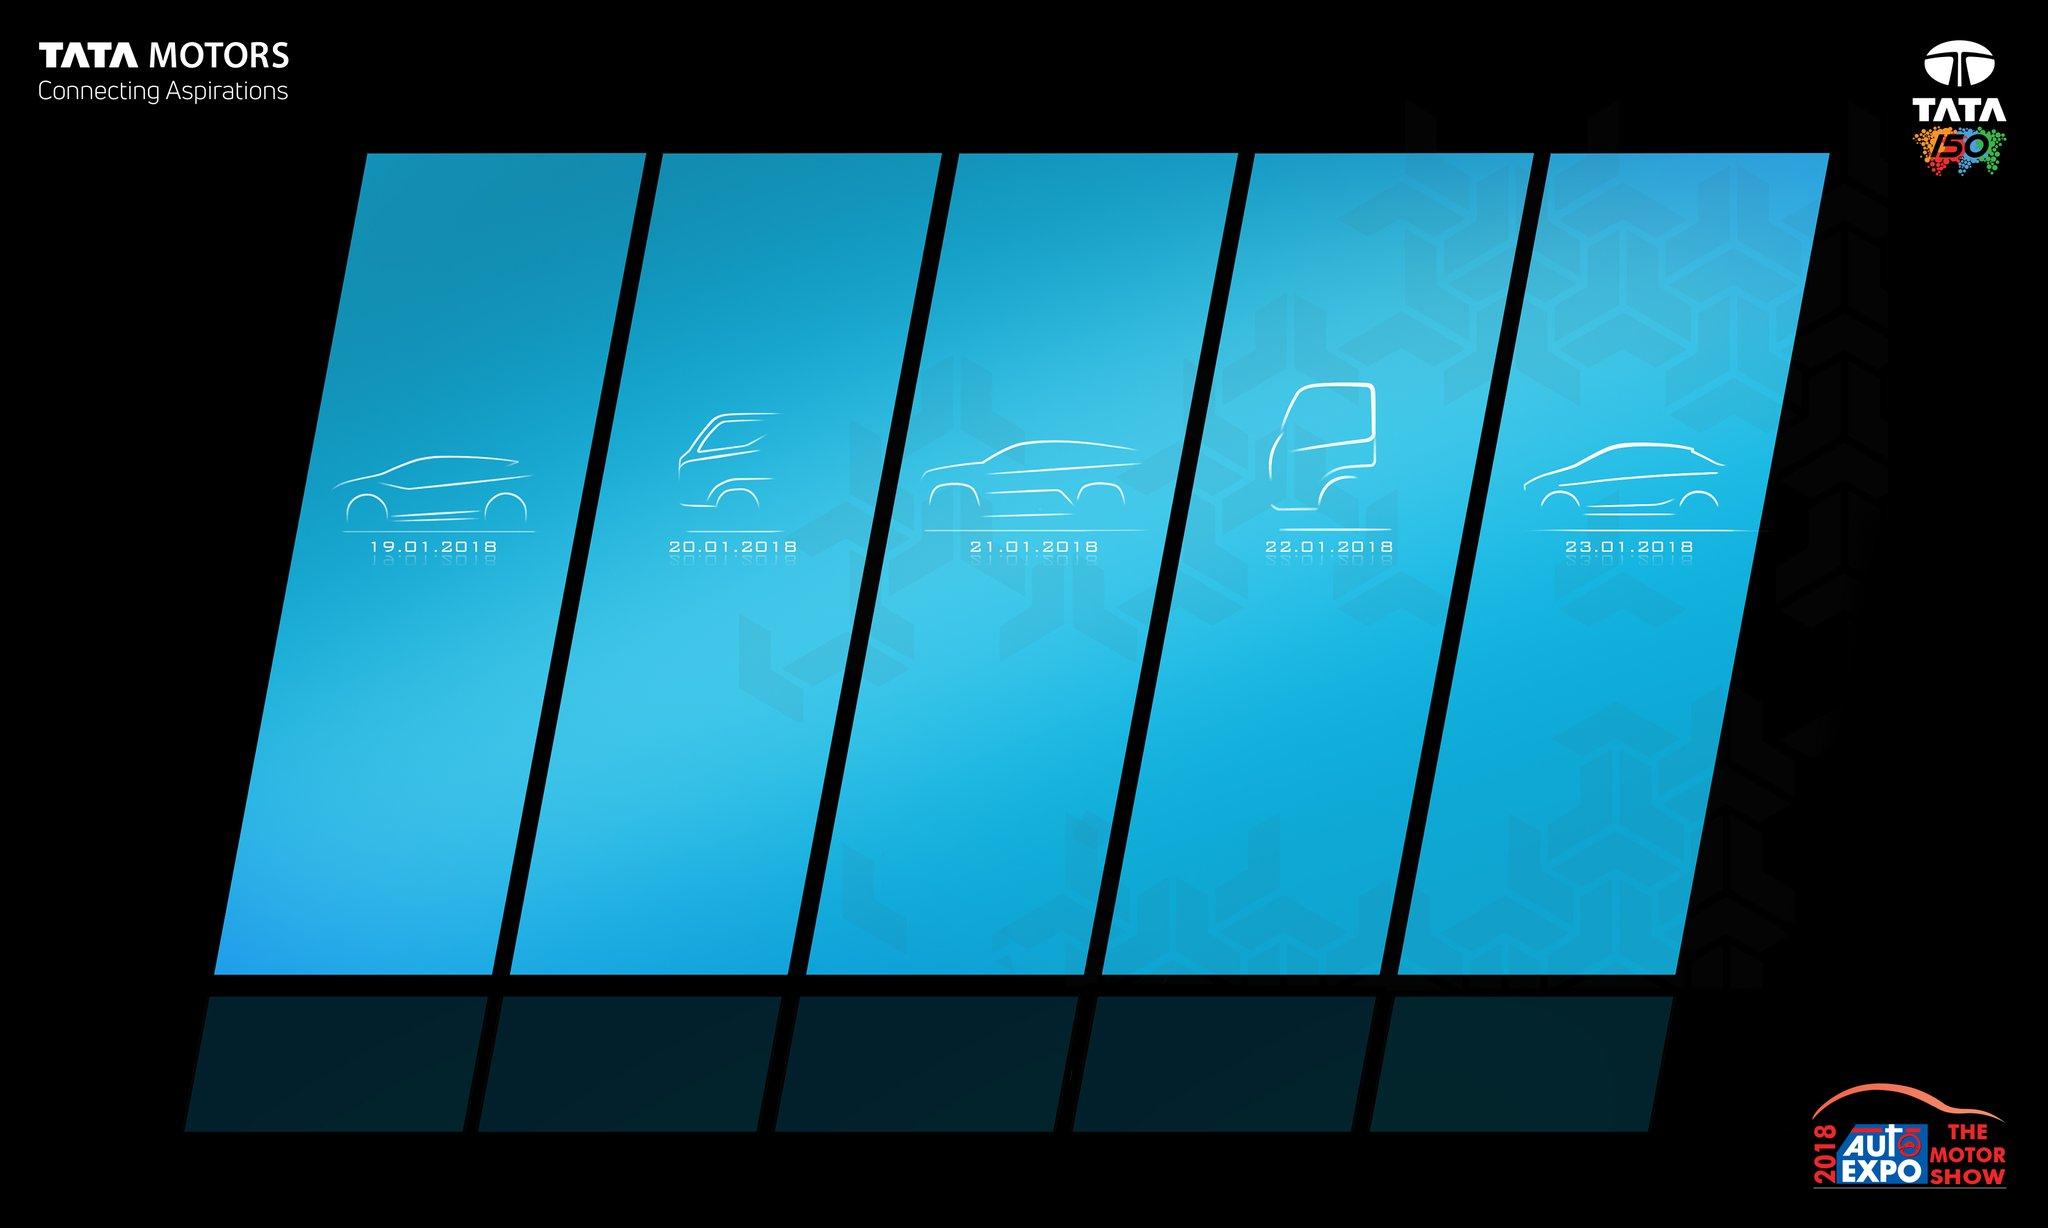 Tata Motors Auto Expo 2018 line-up teaser